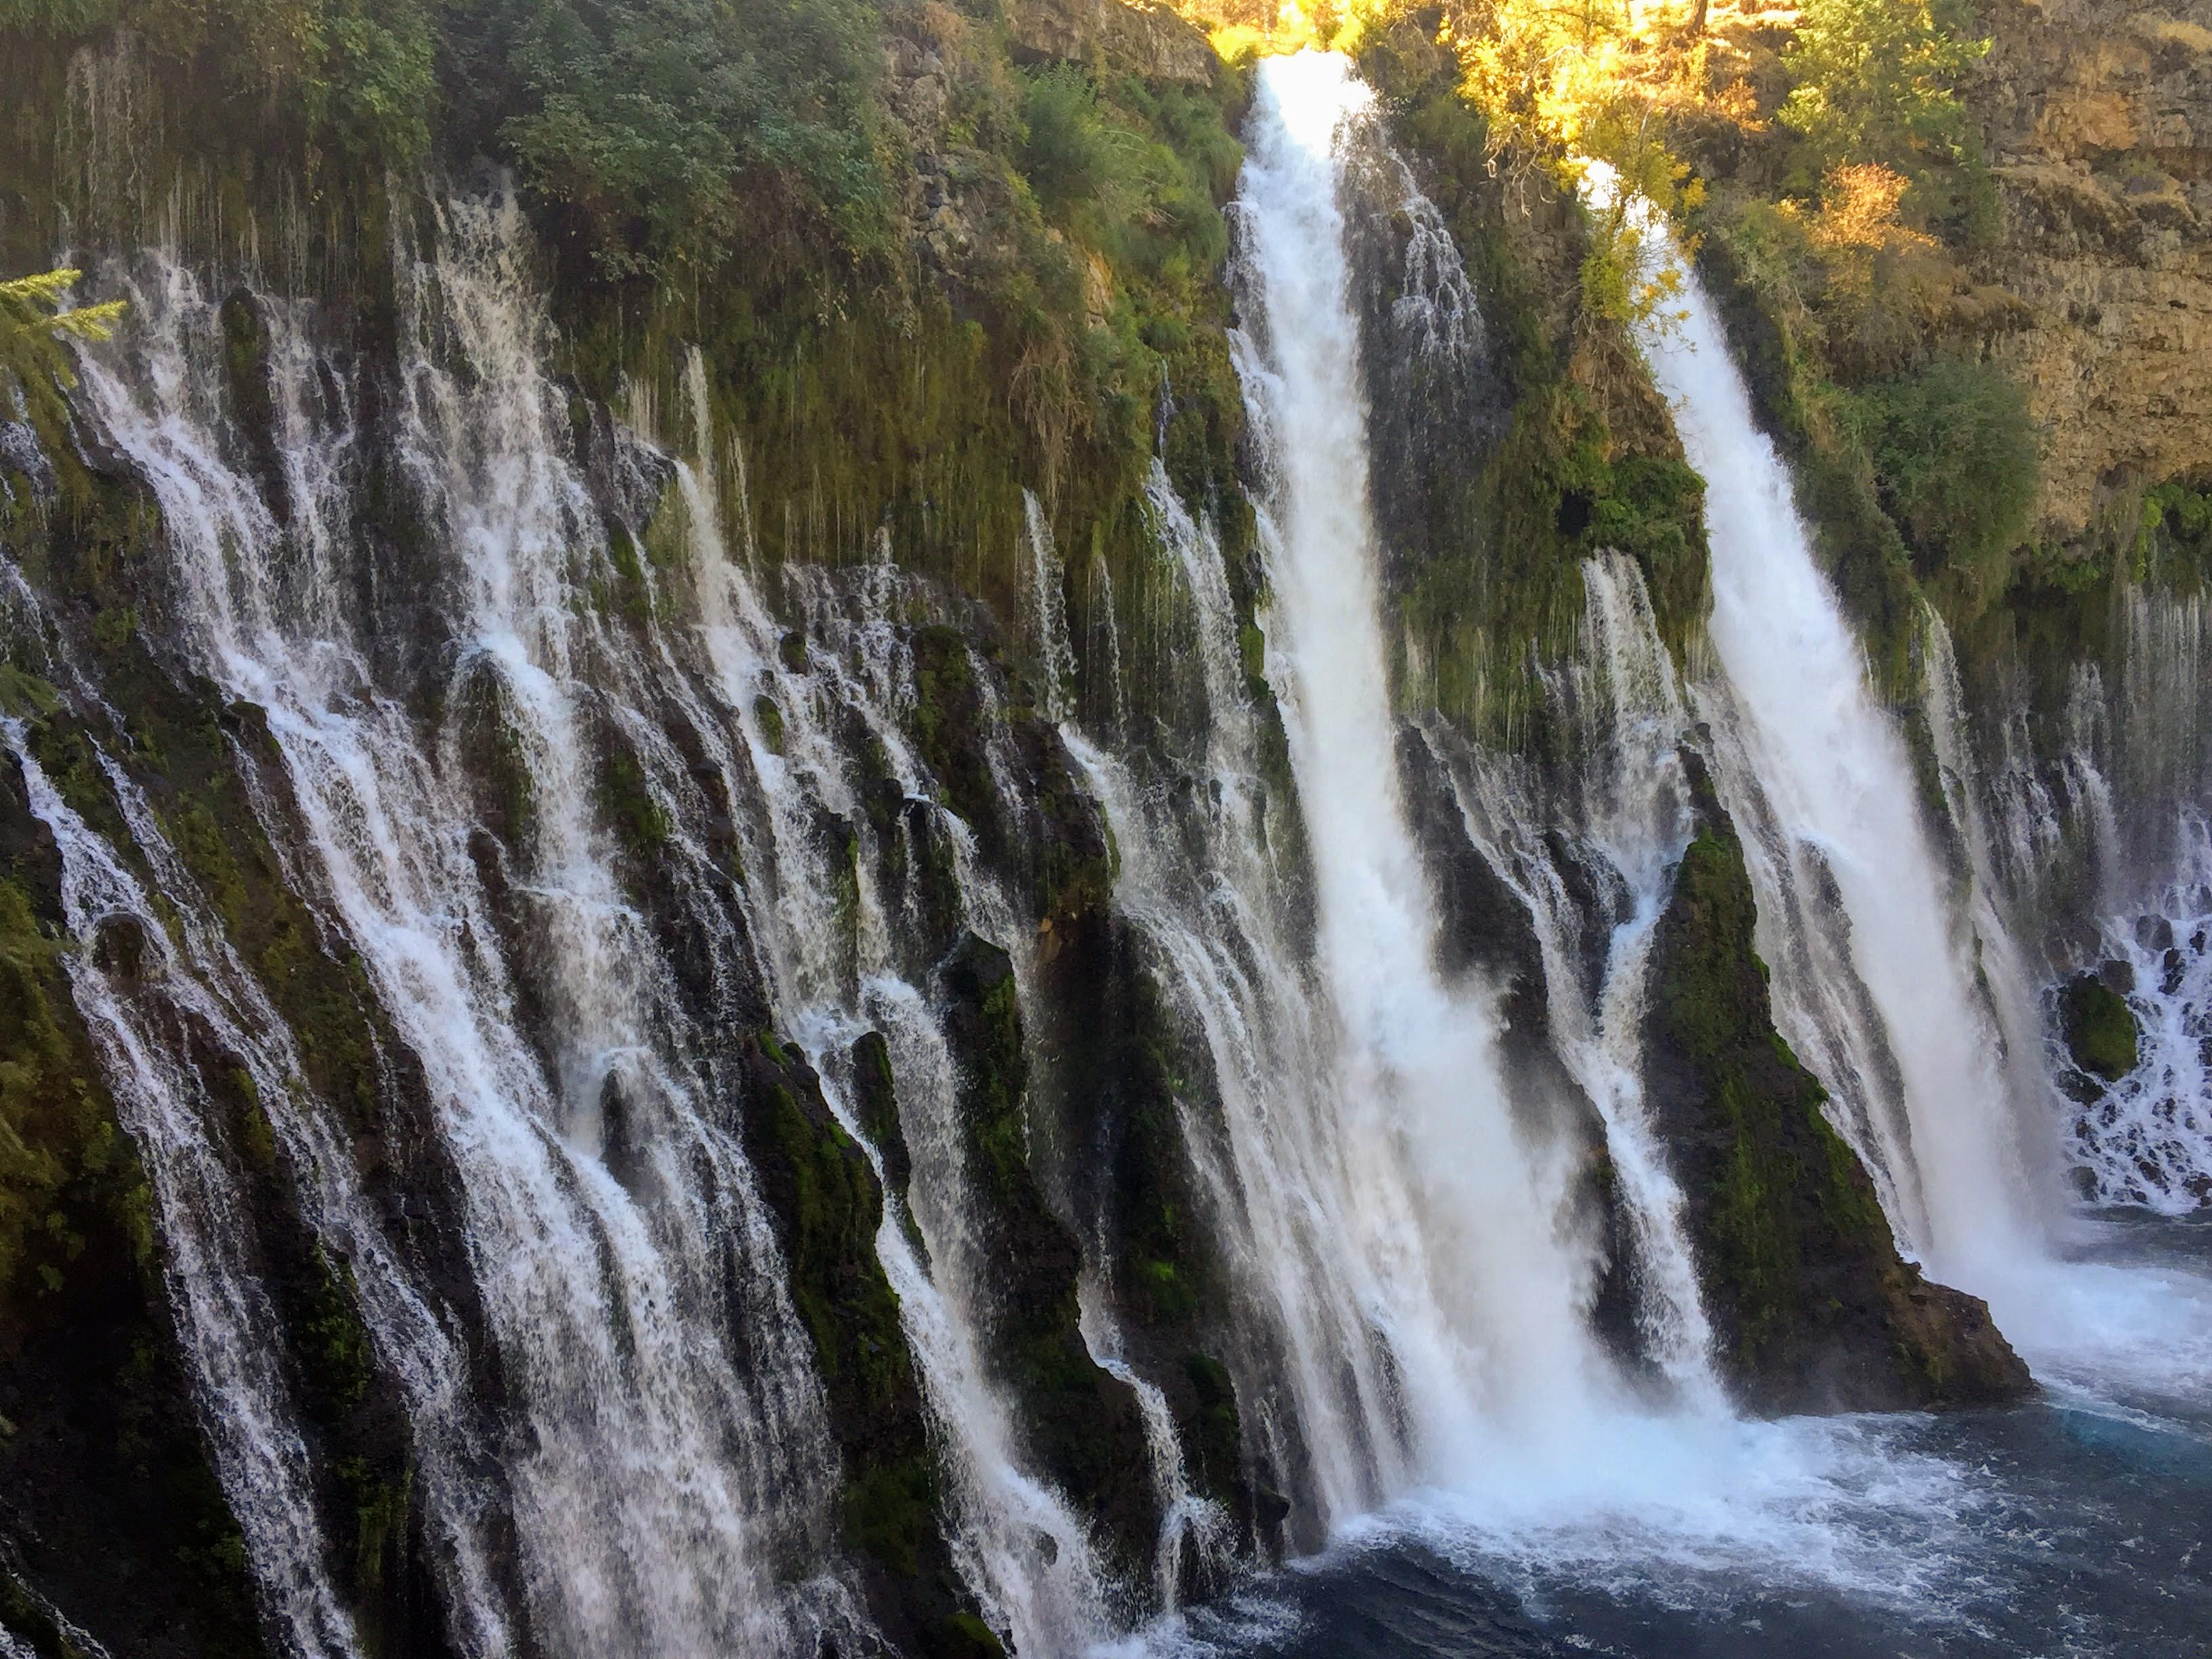 2017-10-05 California 02 Burney Falls 12